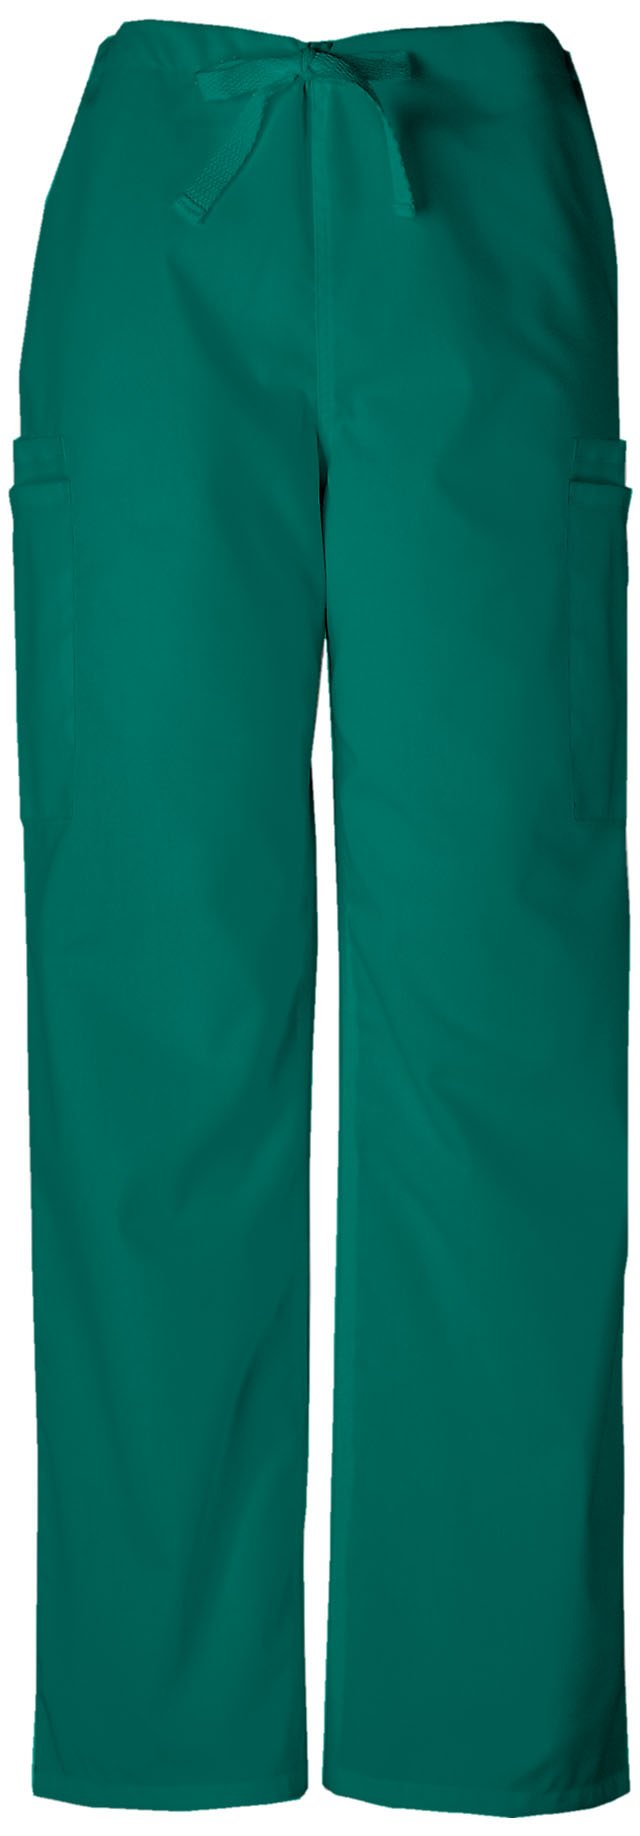 Cherokee Workwear Originals Men's Drawstring Cargo Scrub Pant XXX-Large Petite Caribbean Blue